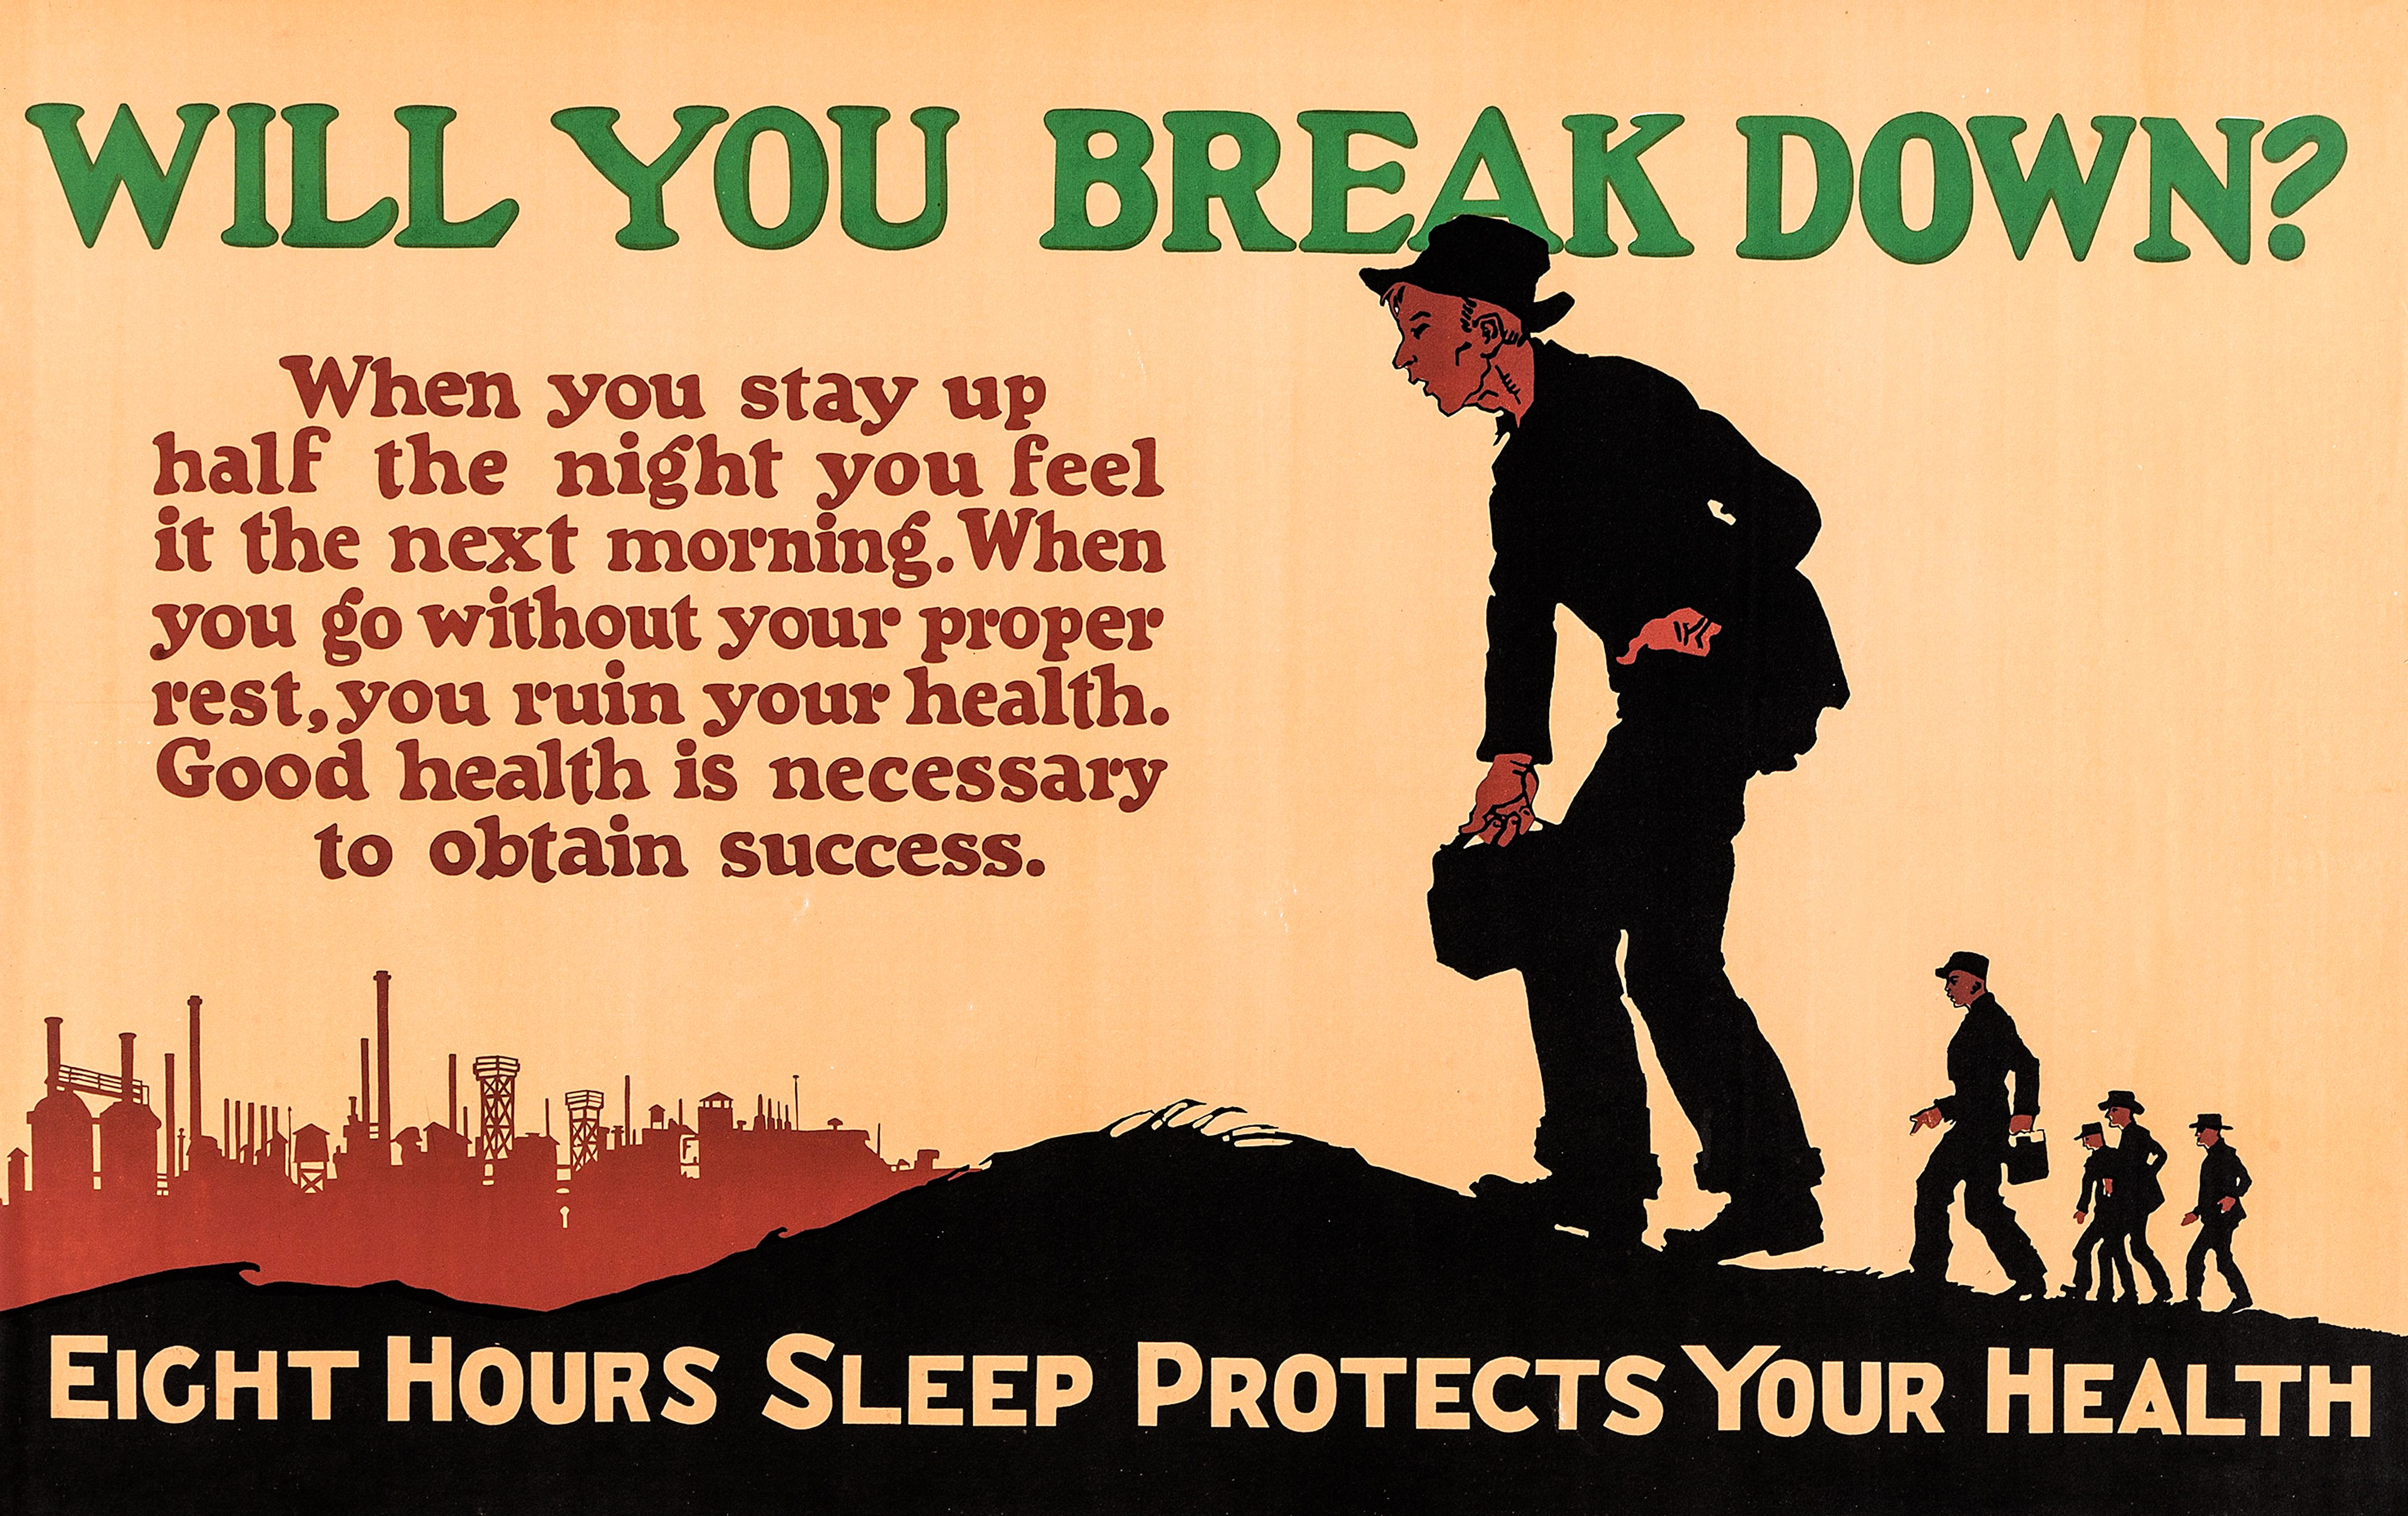 Will You Break Down?